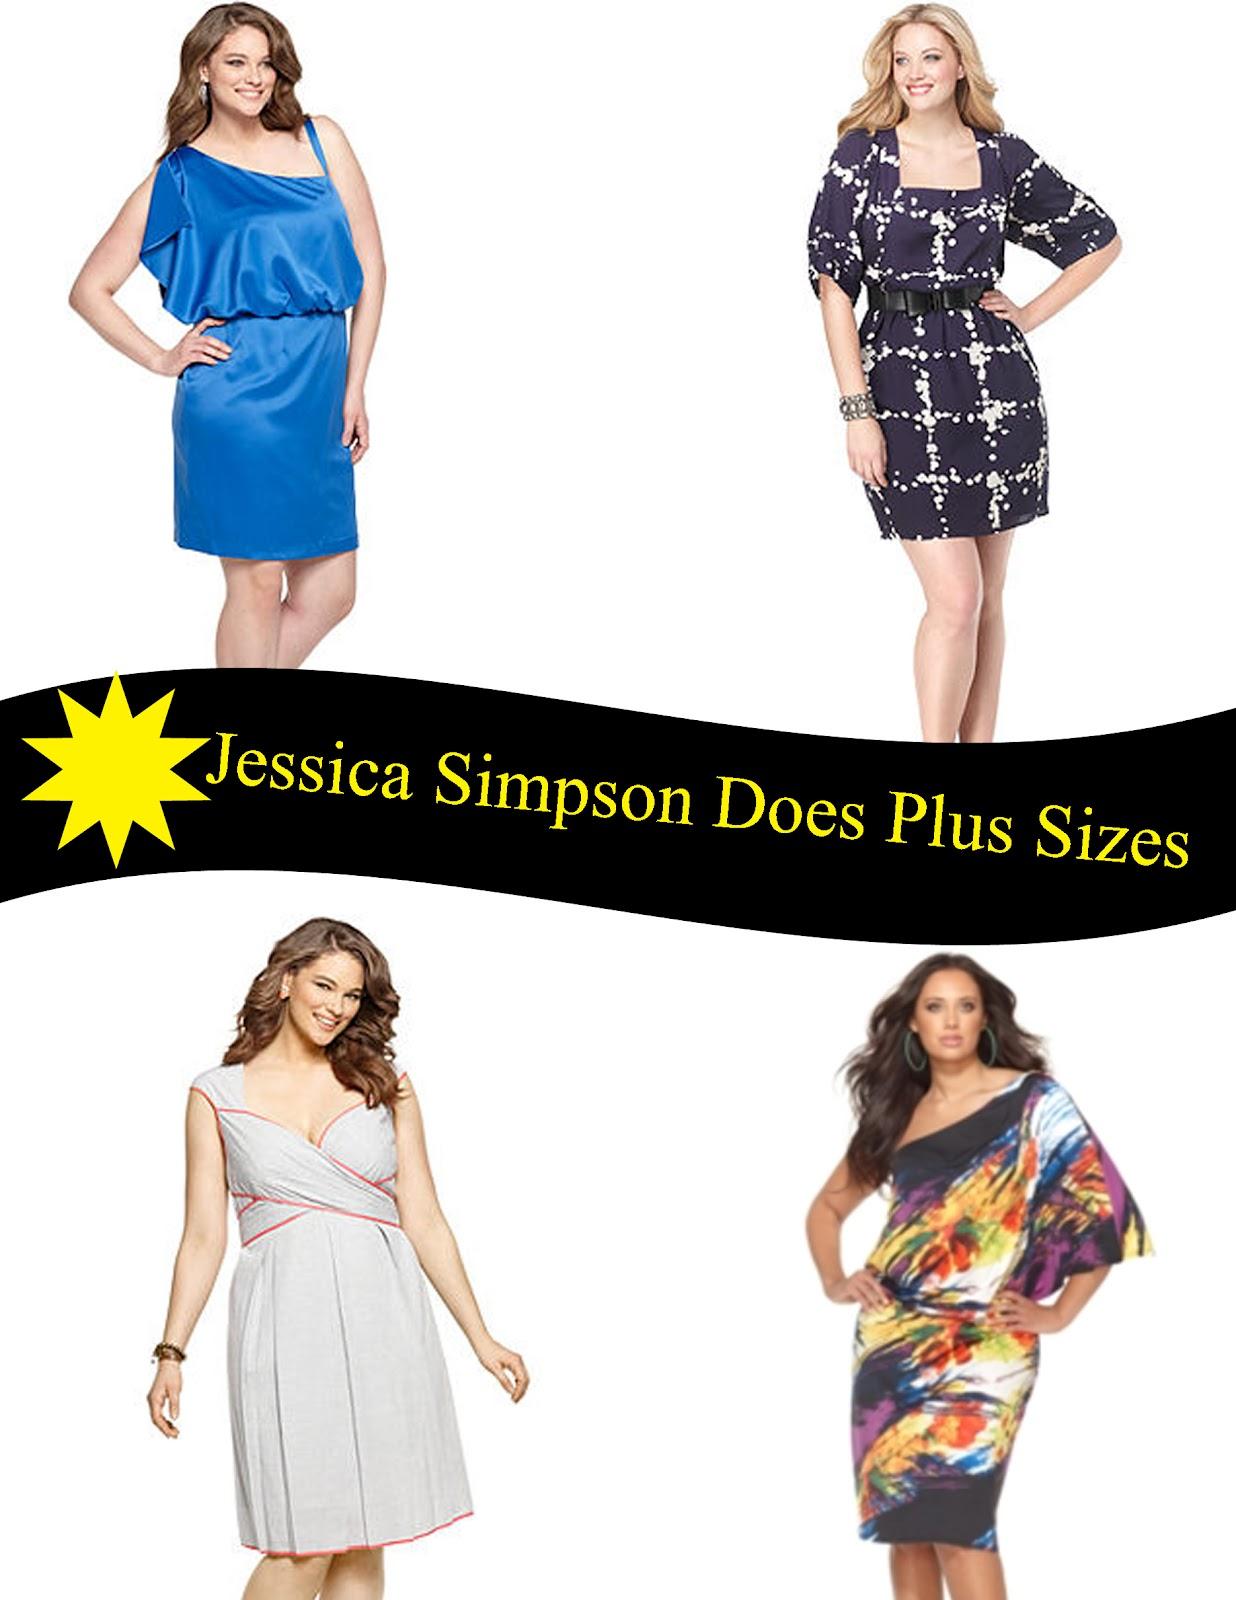 http://3.bp.blogspot.com/-_hDiT9dLrCk/T2NuMyvmMoI/AAAAAAAAMJU/qG8CEbNUzg0/s1600/Jessica.jpg